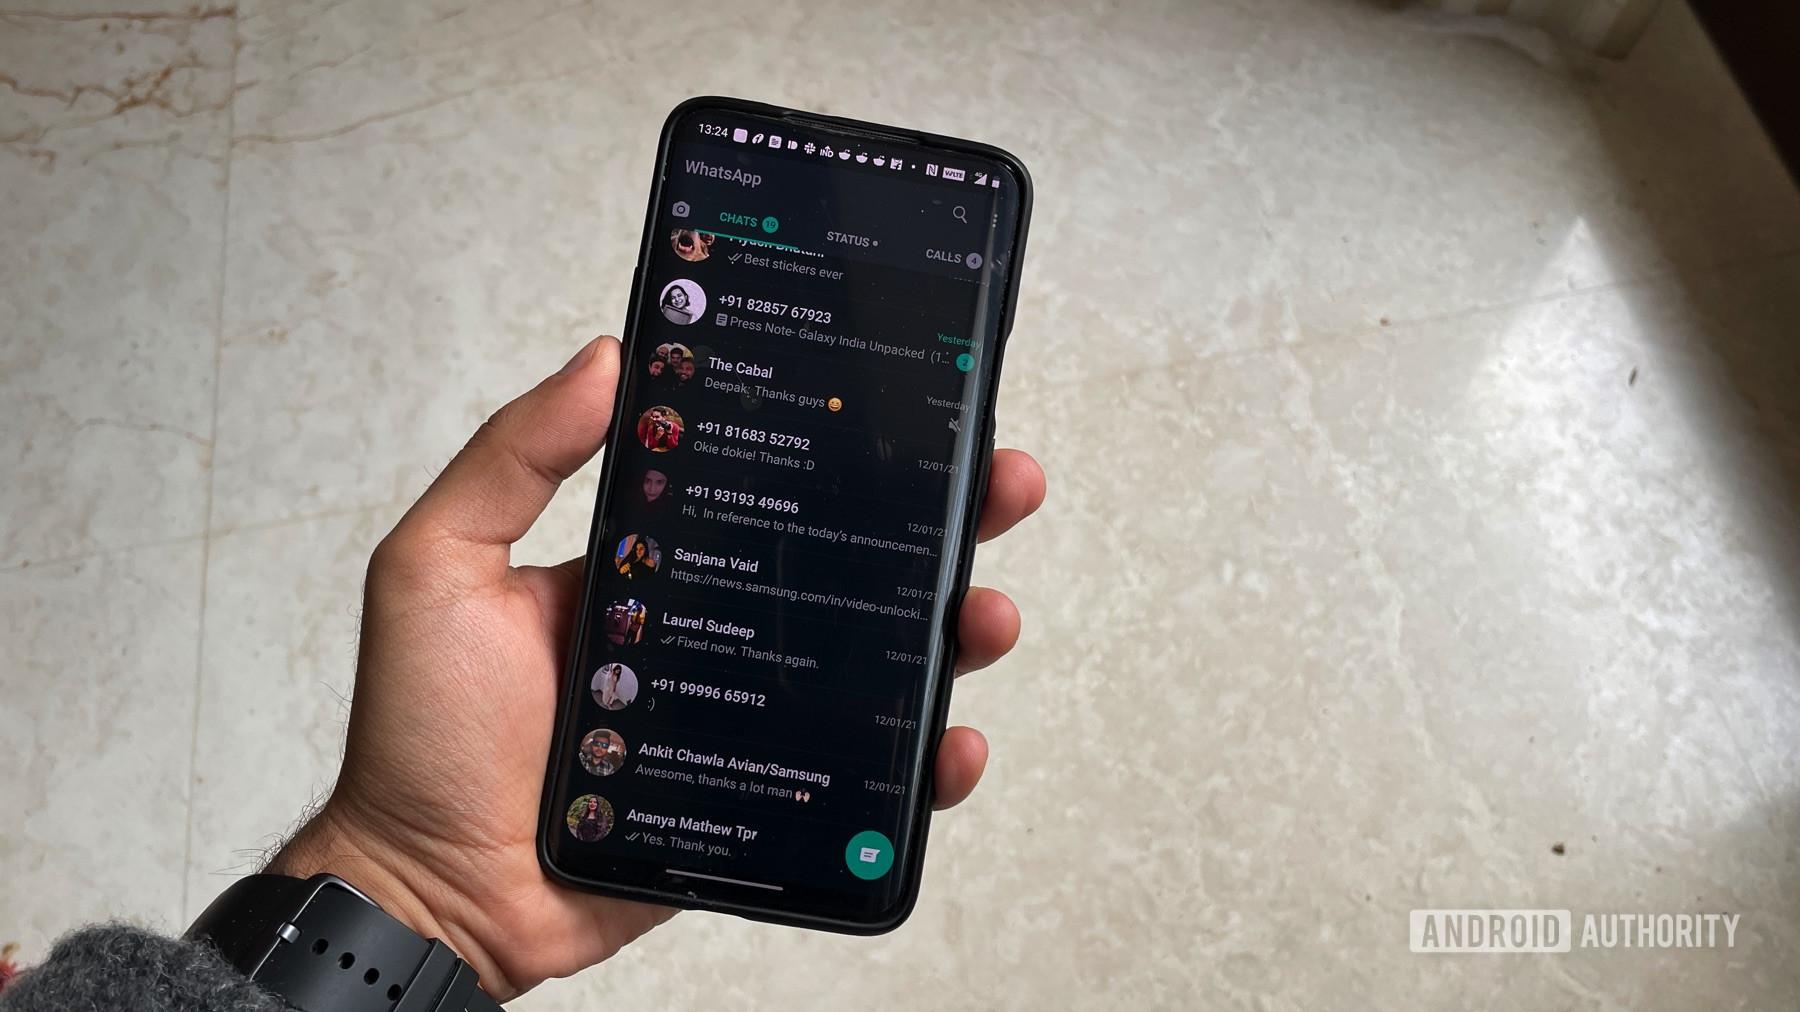 WhatsApp use in hand